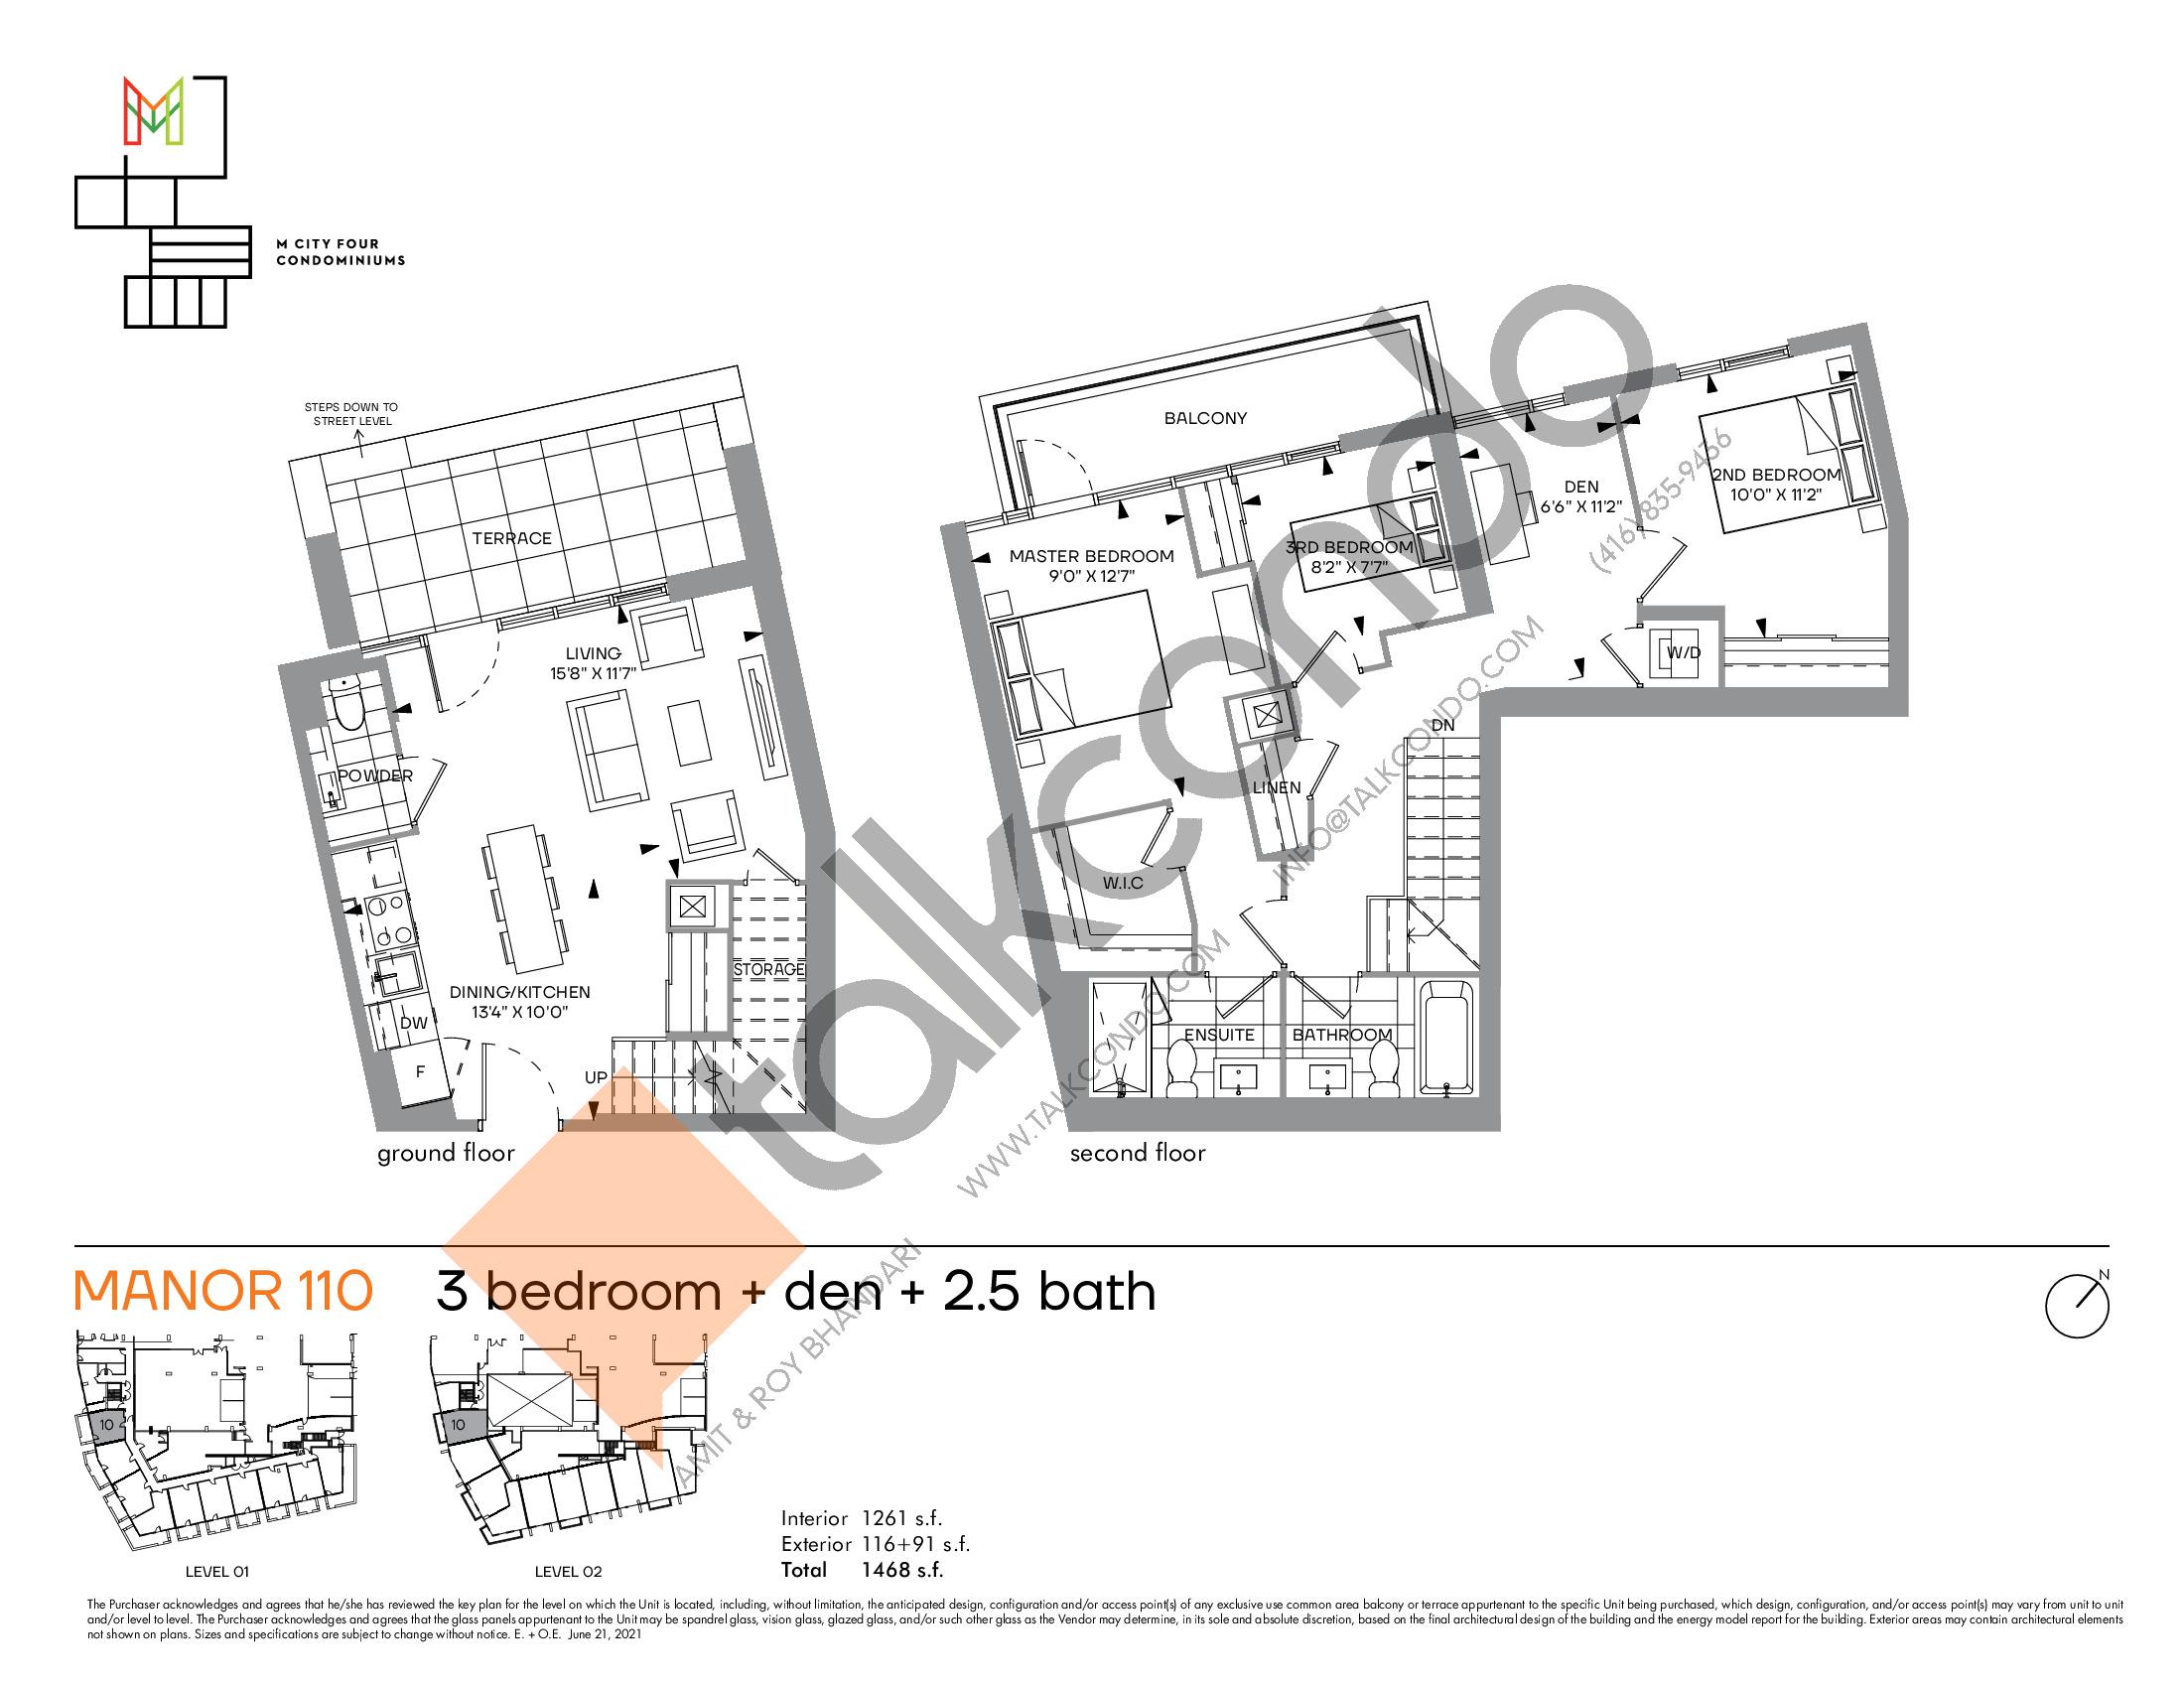 Manor 110 Floor Plan at M4 Condos - 1261 sq.ft